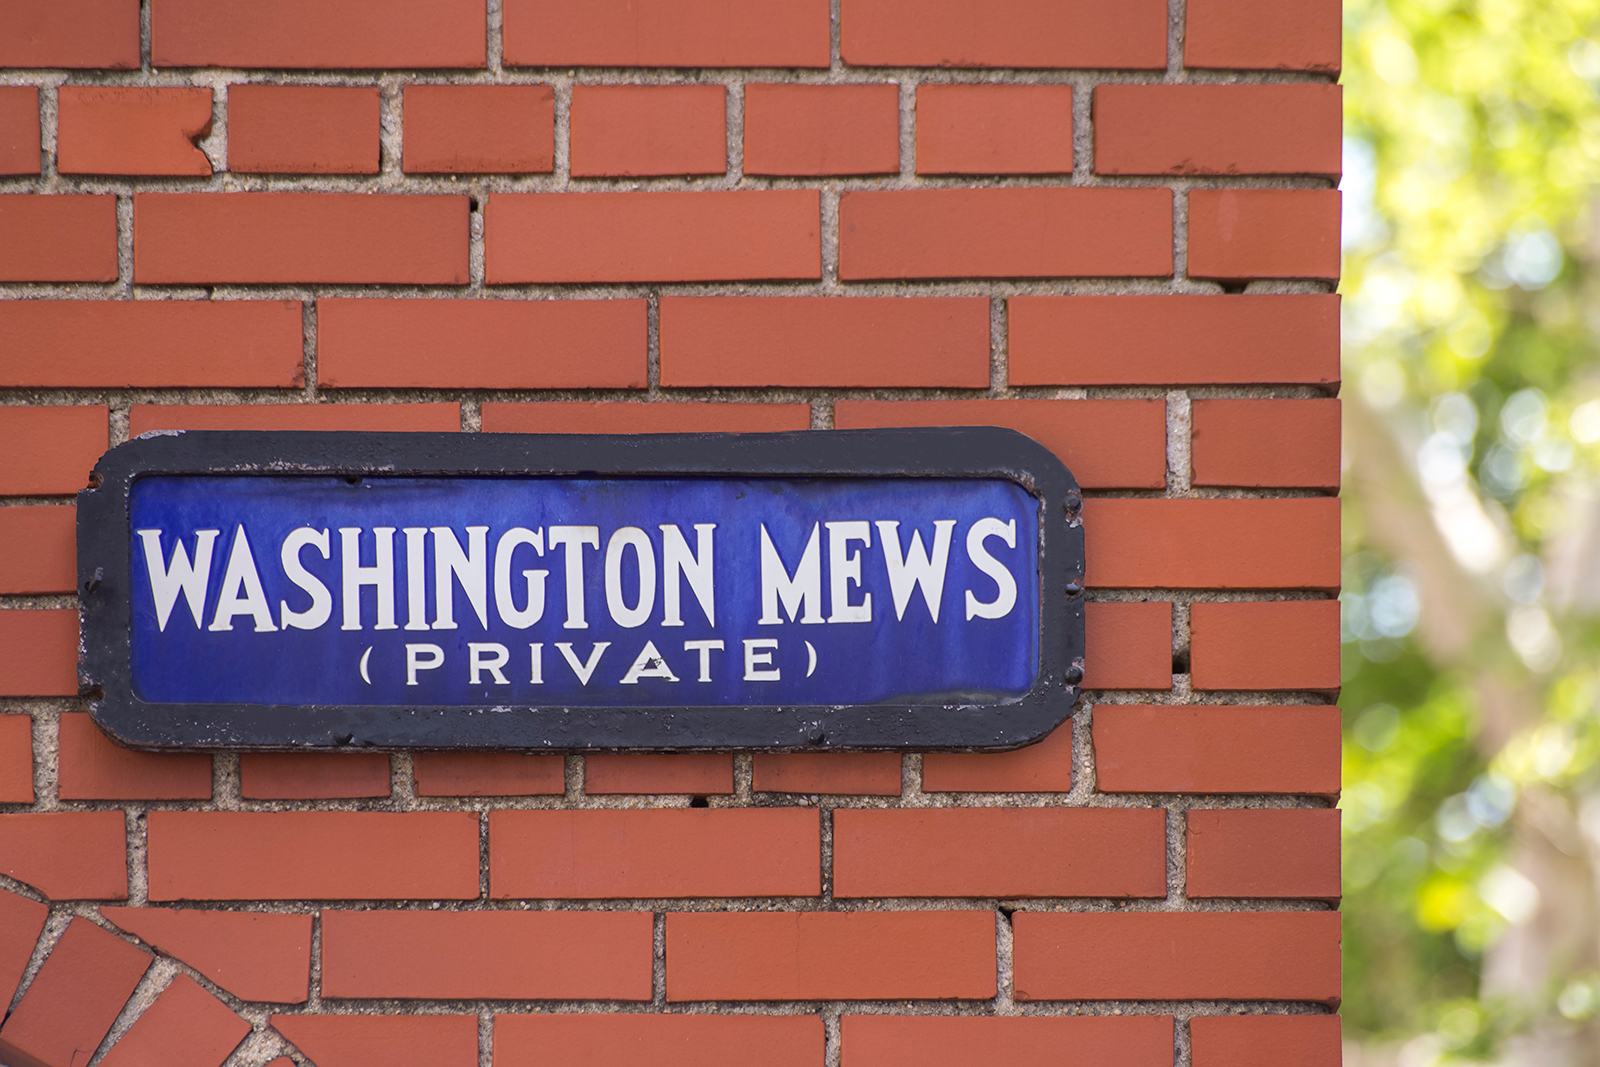 61 washington mews, greenwich village, washington mews